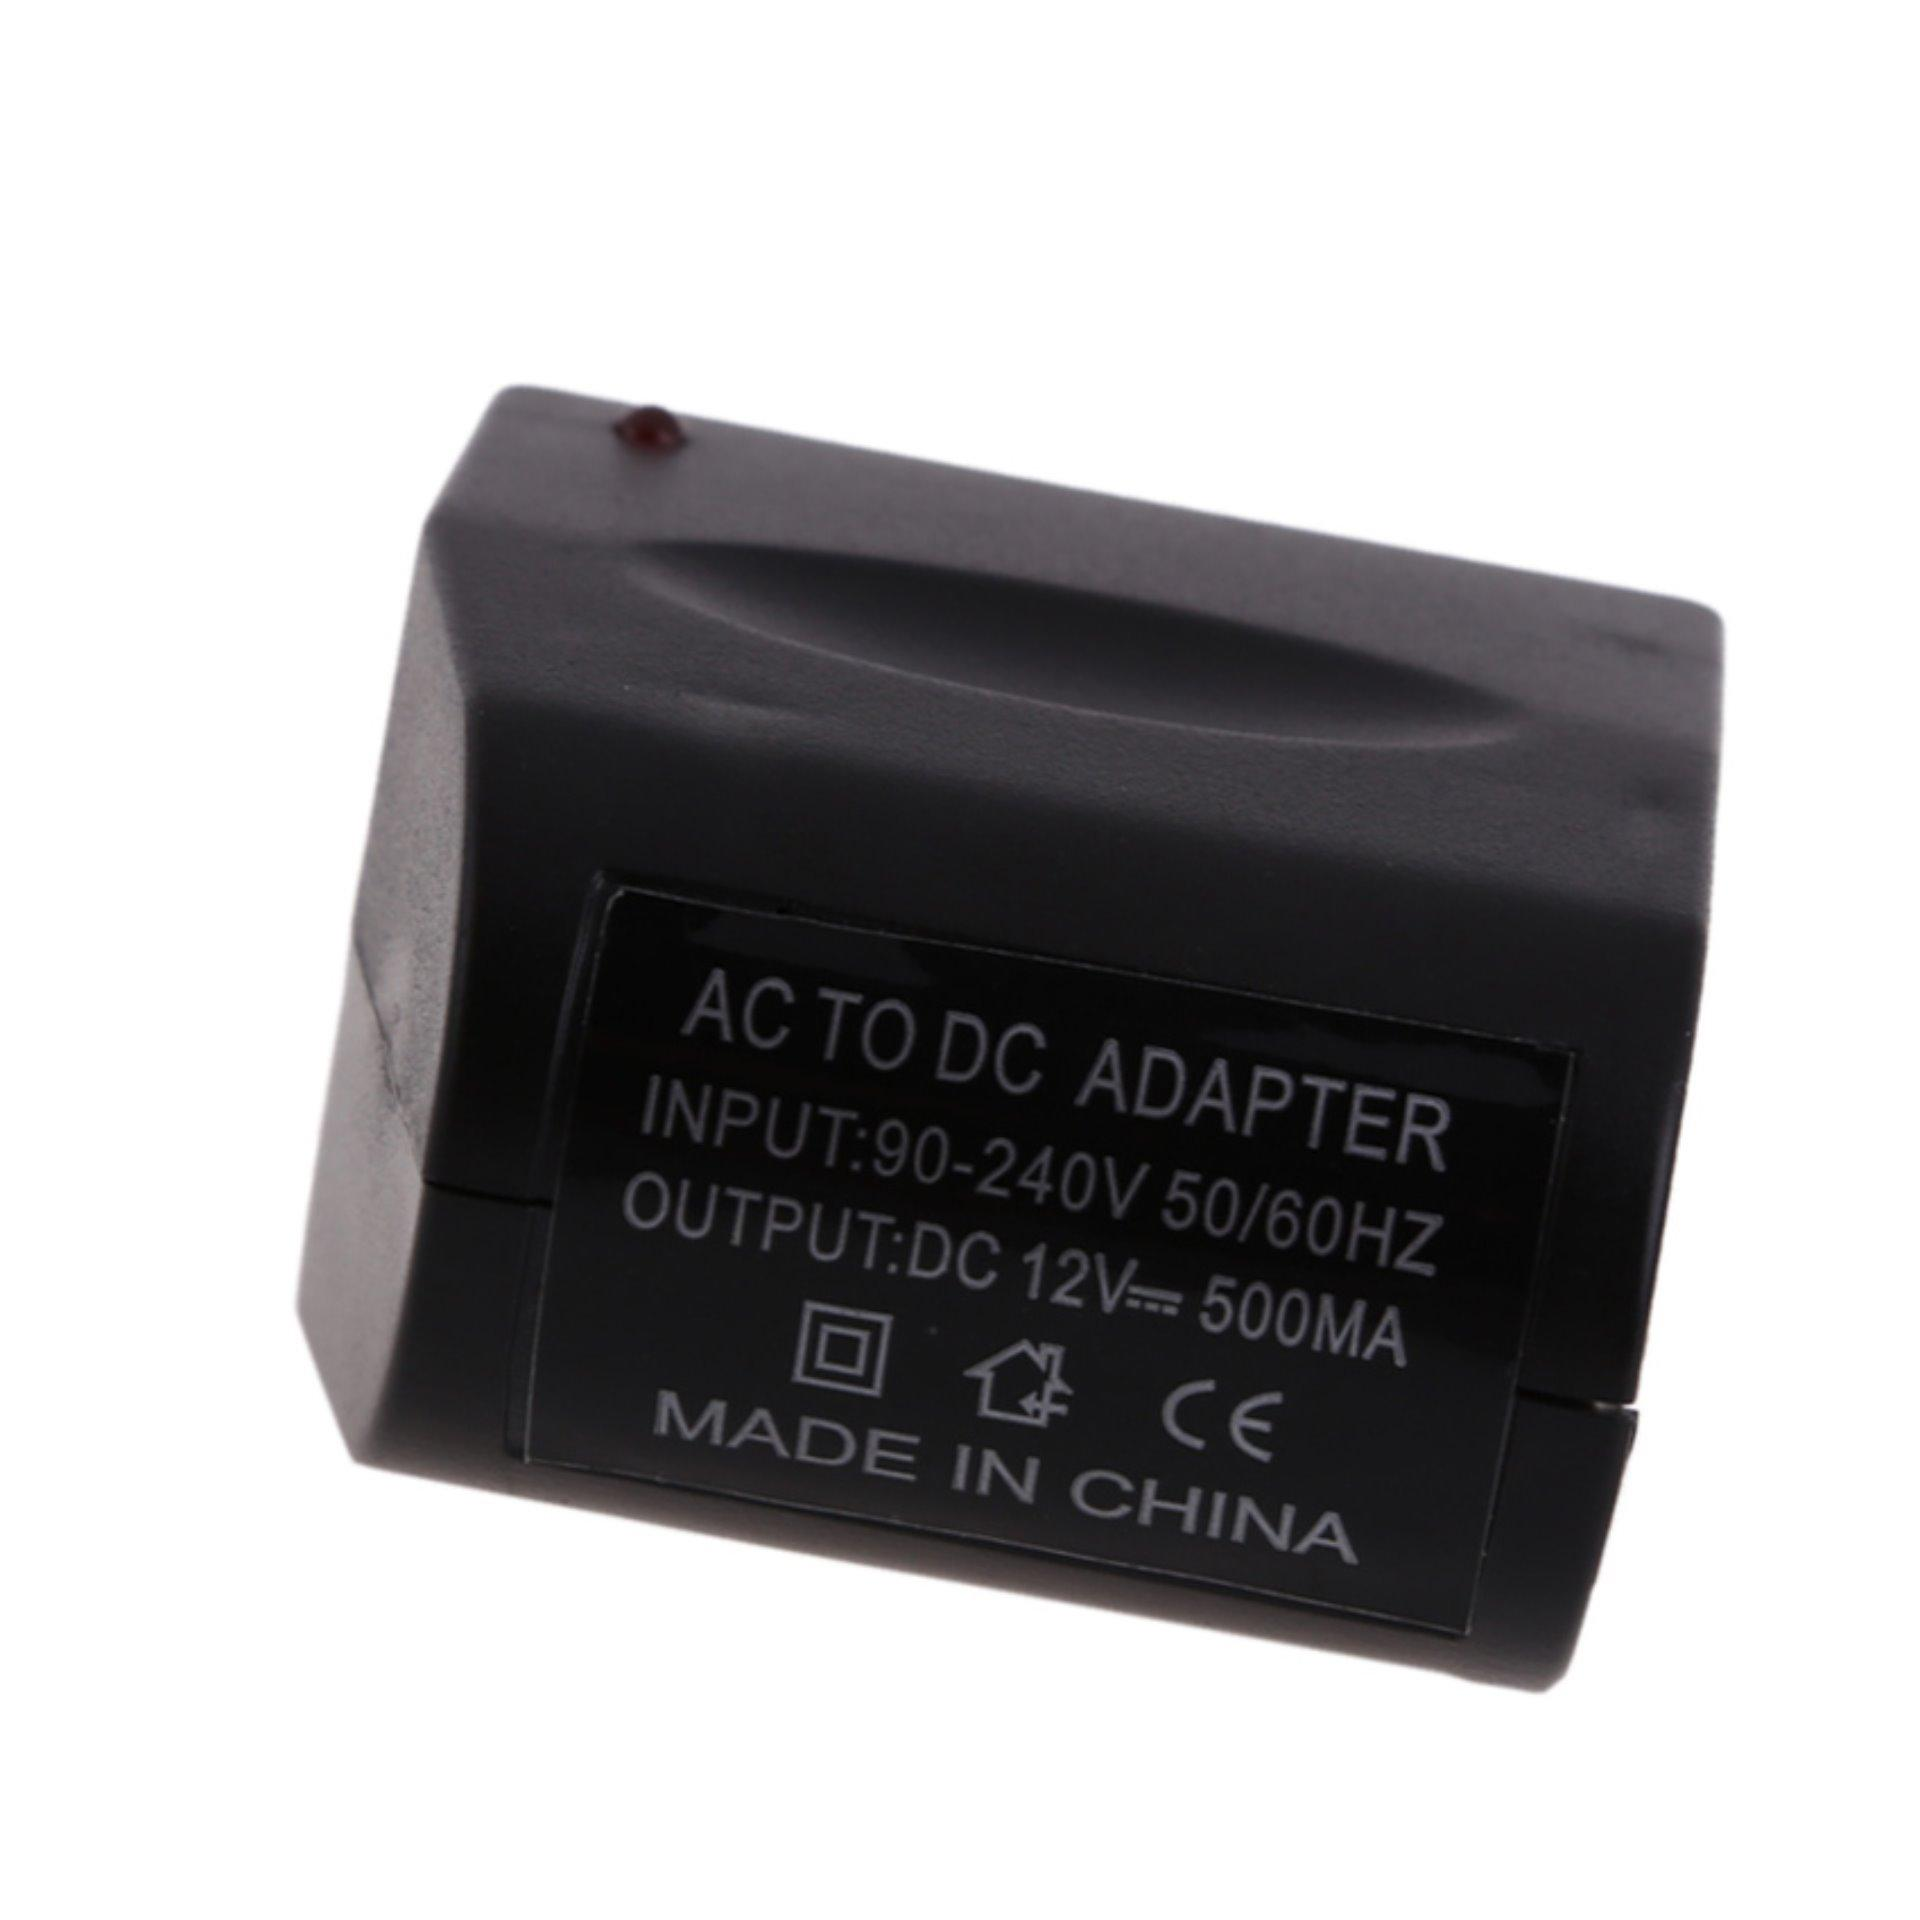 Power Adapter Car Lighter Socket 110v 220v Ac 12v Dc Hitam Spec Converter 90240v To 9v 500ma Led Switching Supply